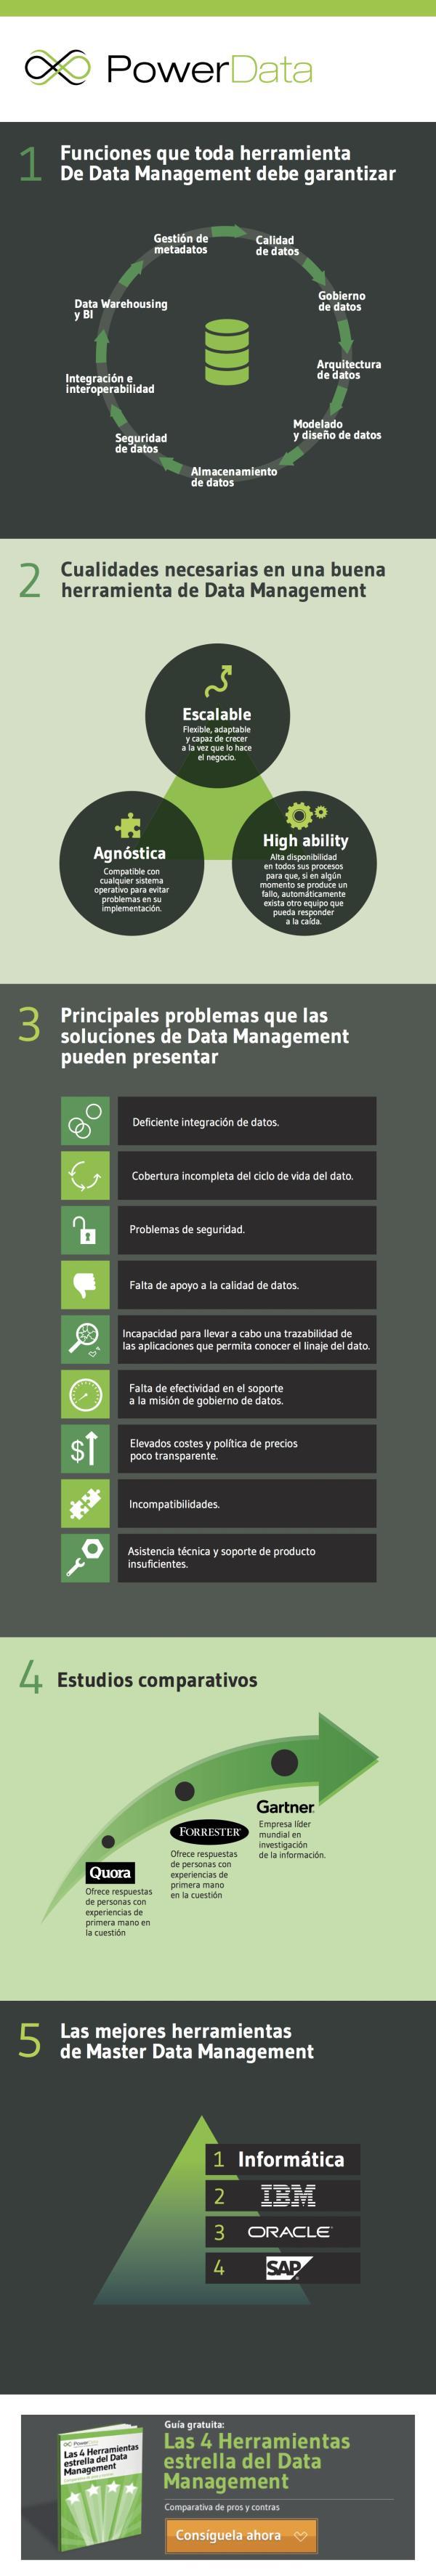 infografia   herramientas data management gestion datos resized 600